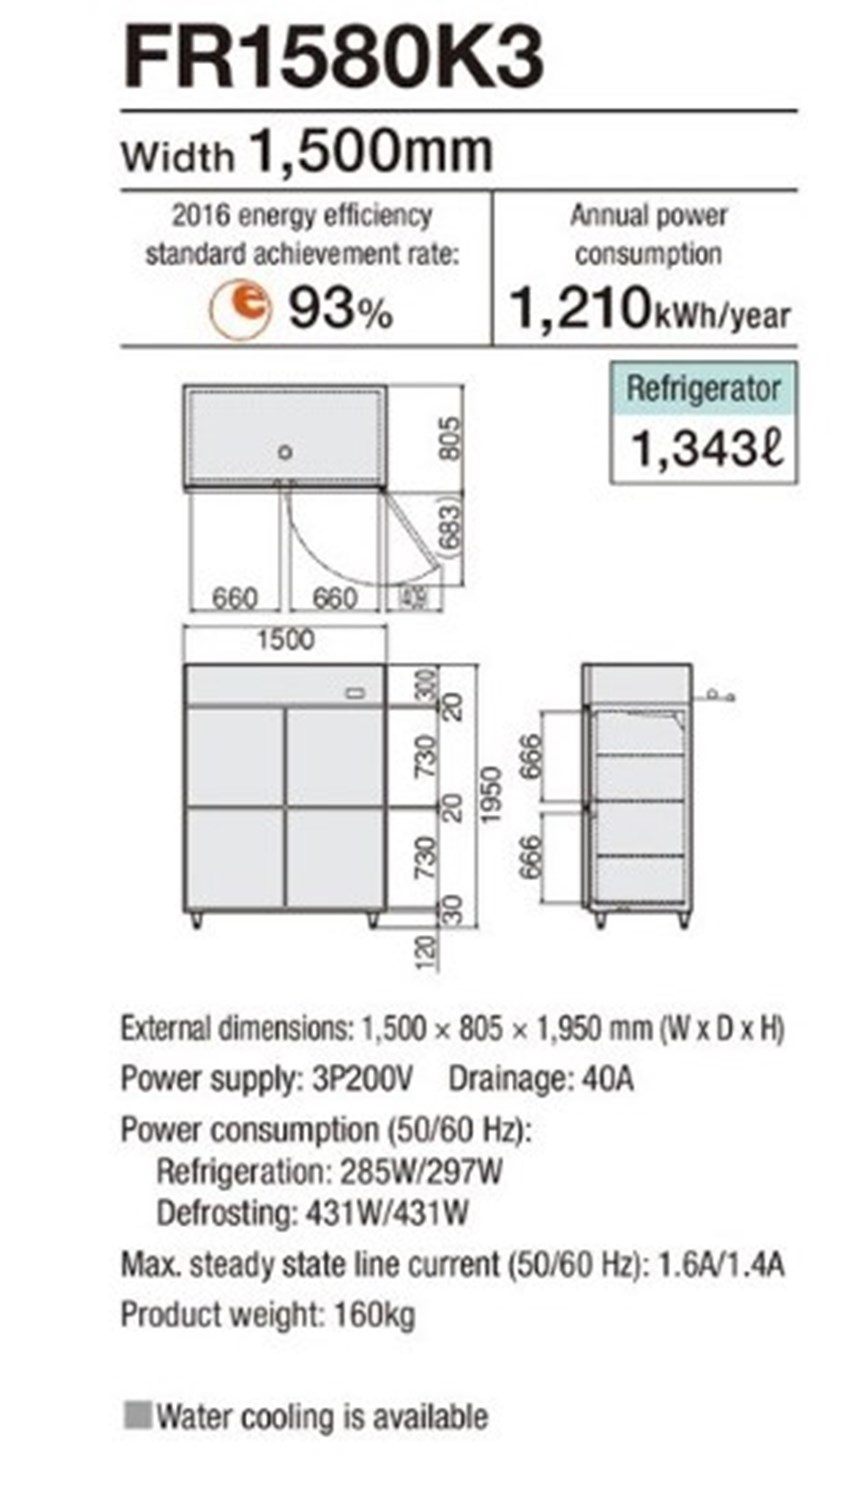 tu mat 4 canh fujimak fr1580k3 ( nhat ban) hinh 0